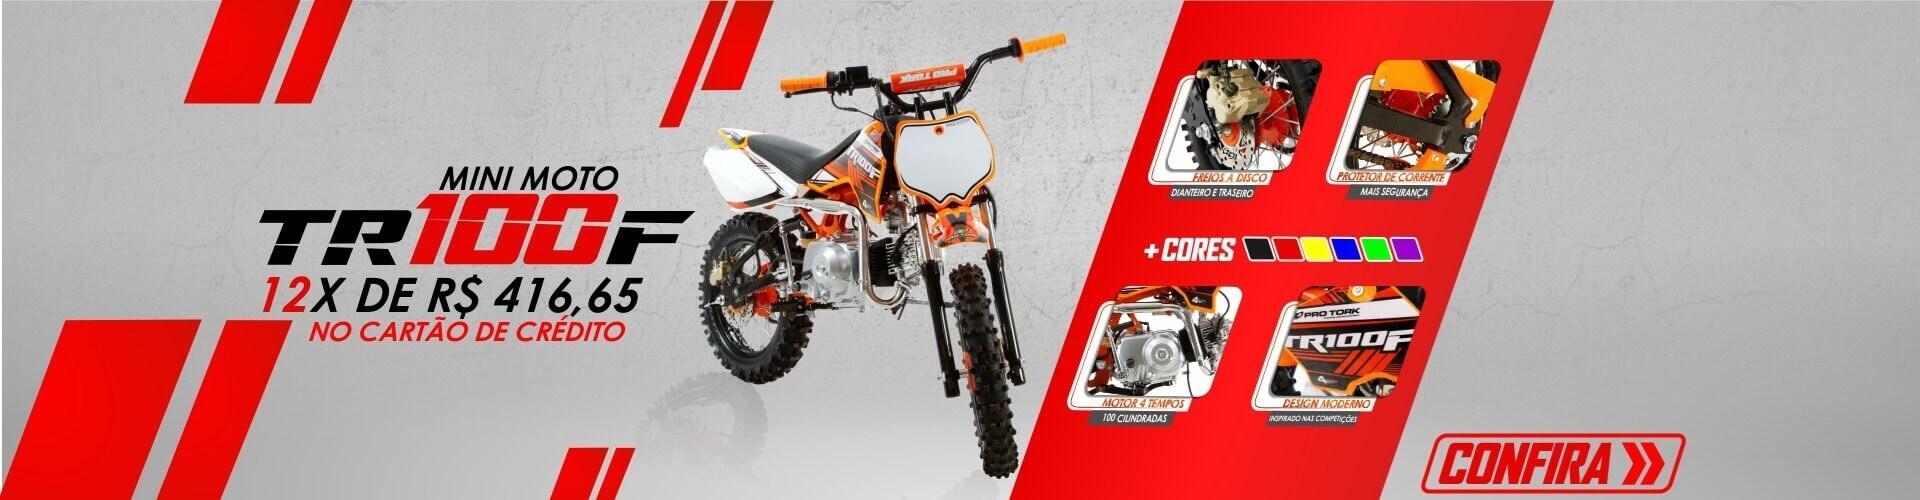 Mini Moto Tr100